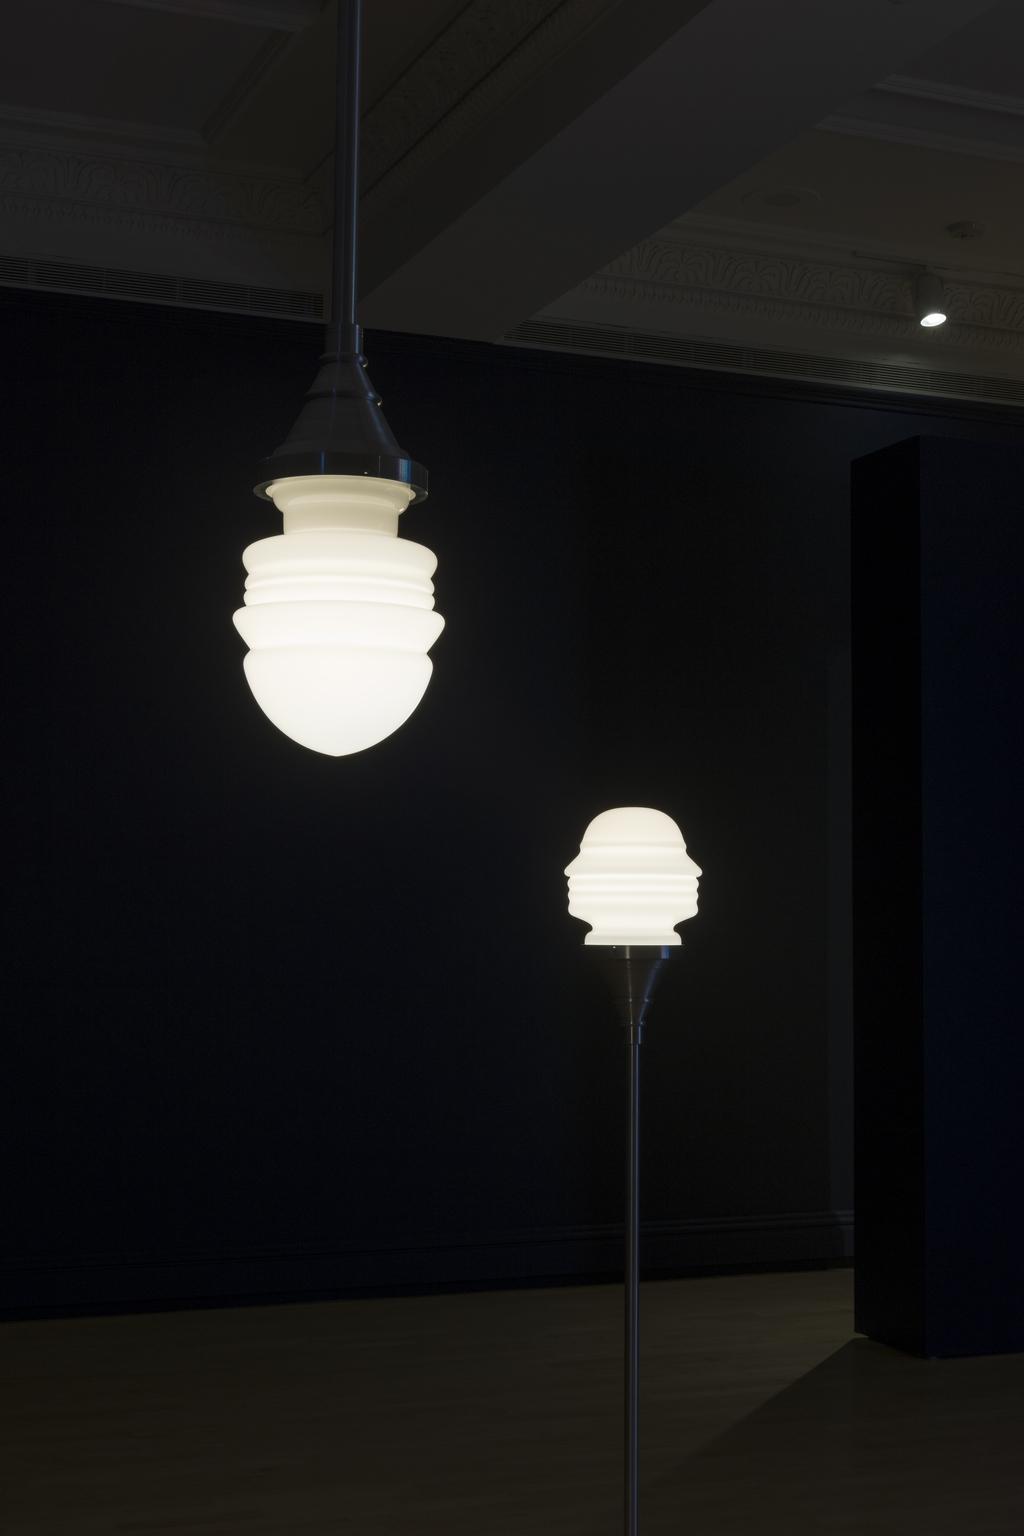 Lampes : Marinetti/Mussolini